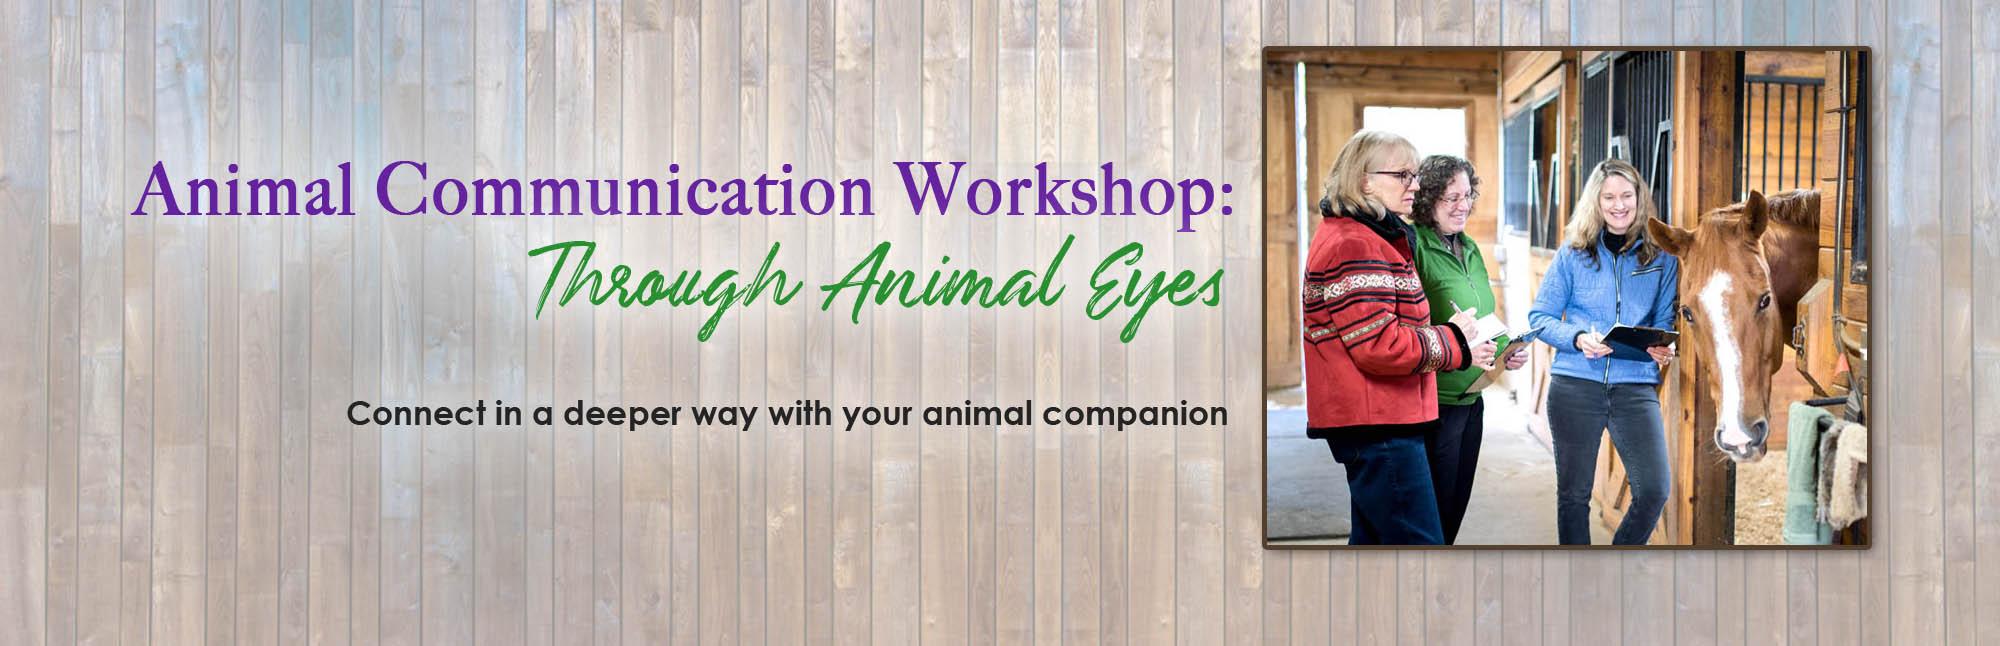 animal-communication-workshop-janet-dobbs